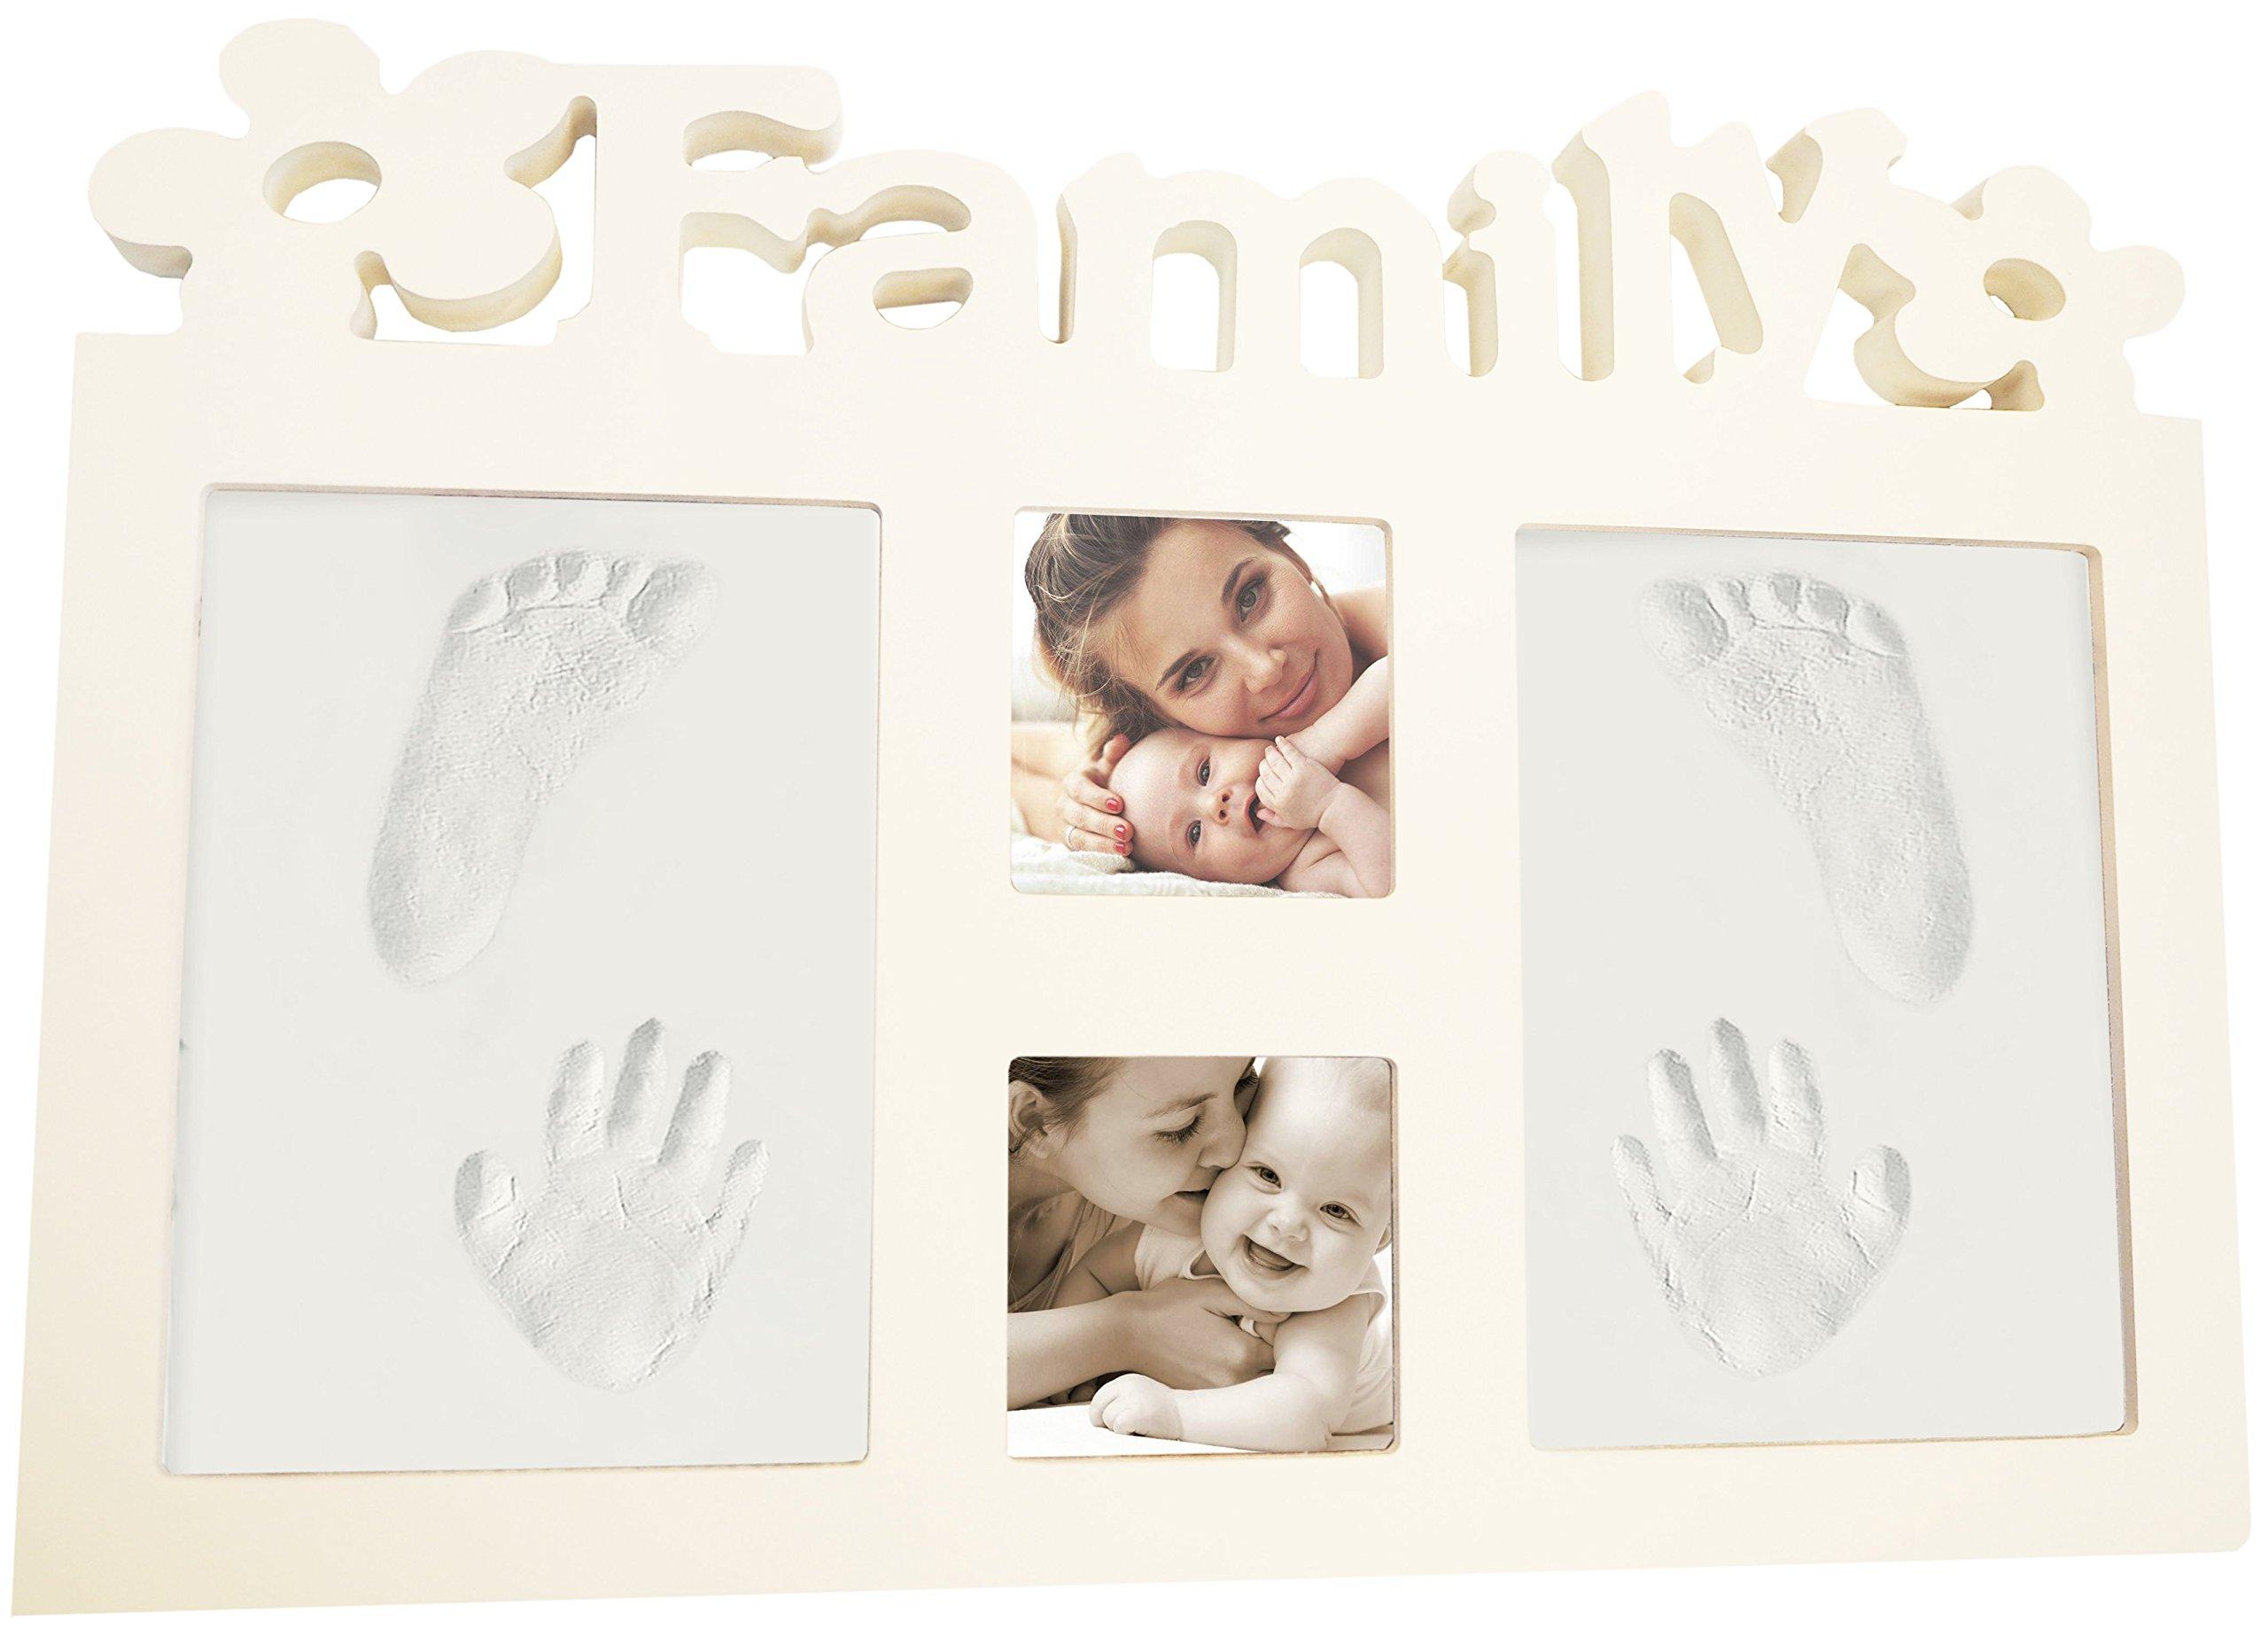 Babyprint Photo Frame Baby Handprint Impression Kit Clay Footprint Keepsake Baby Shower Gift for Room Wall Decor